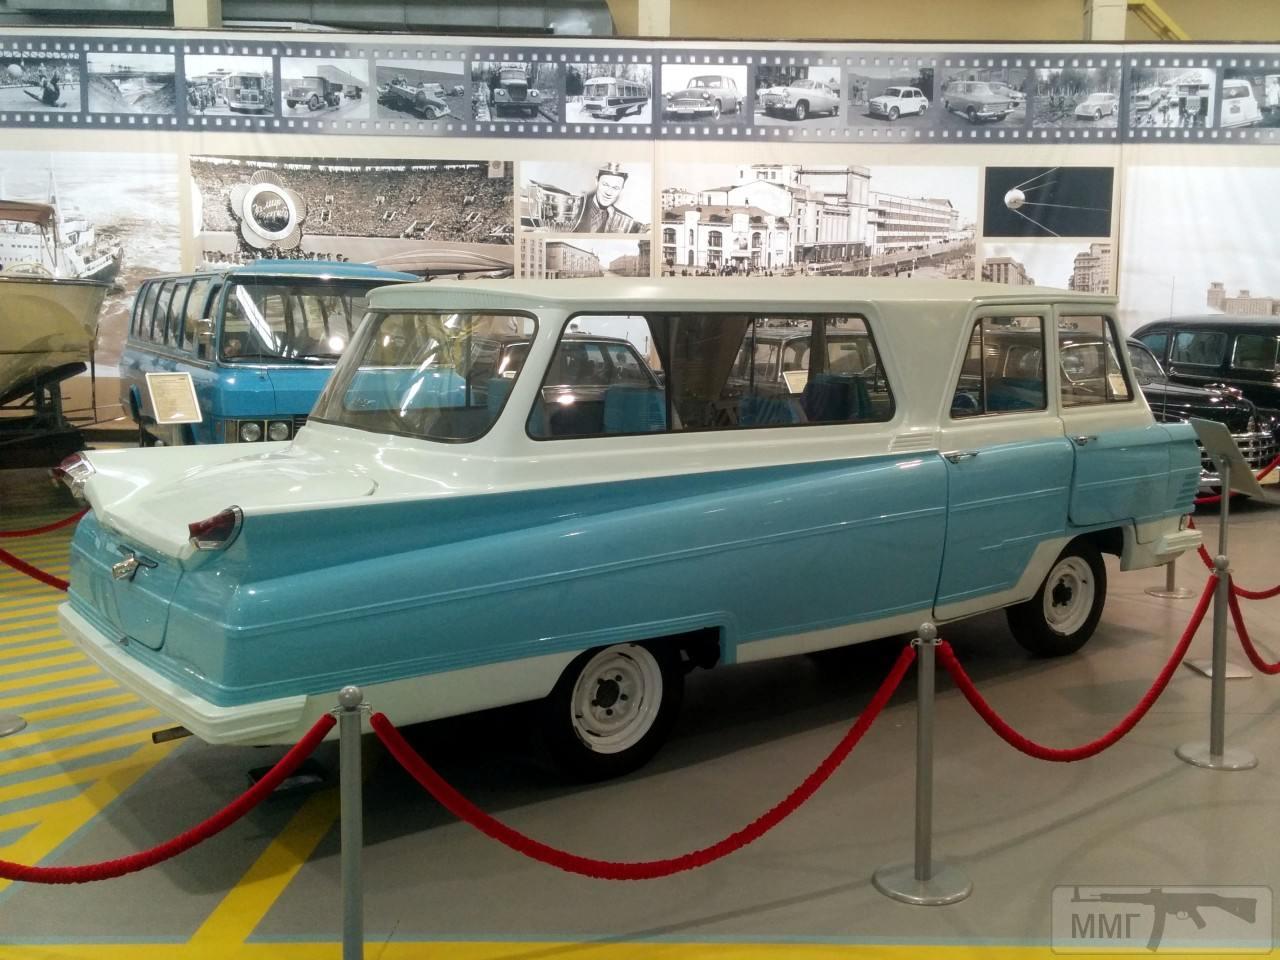 41370 - Музей техники Фаэтон в г. Запорожье